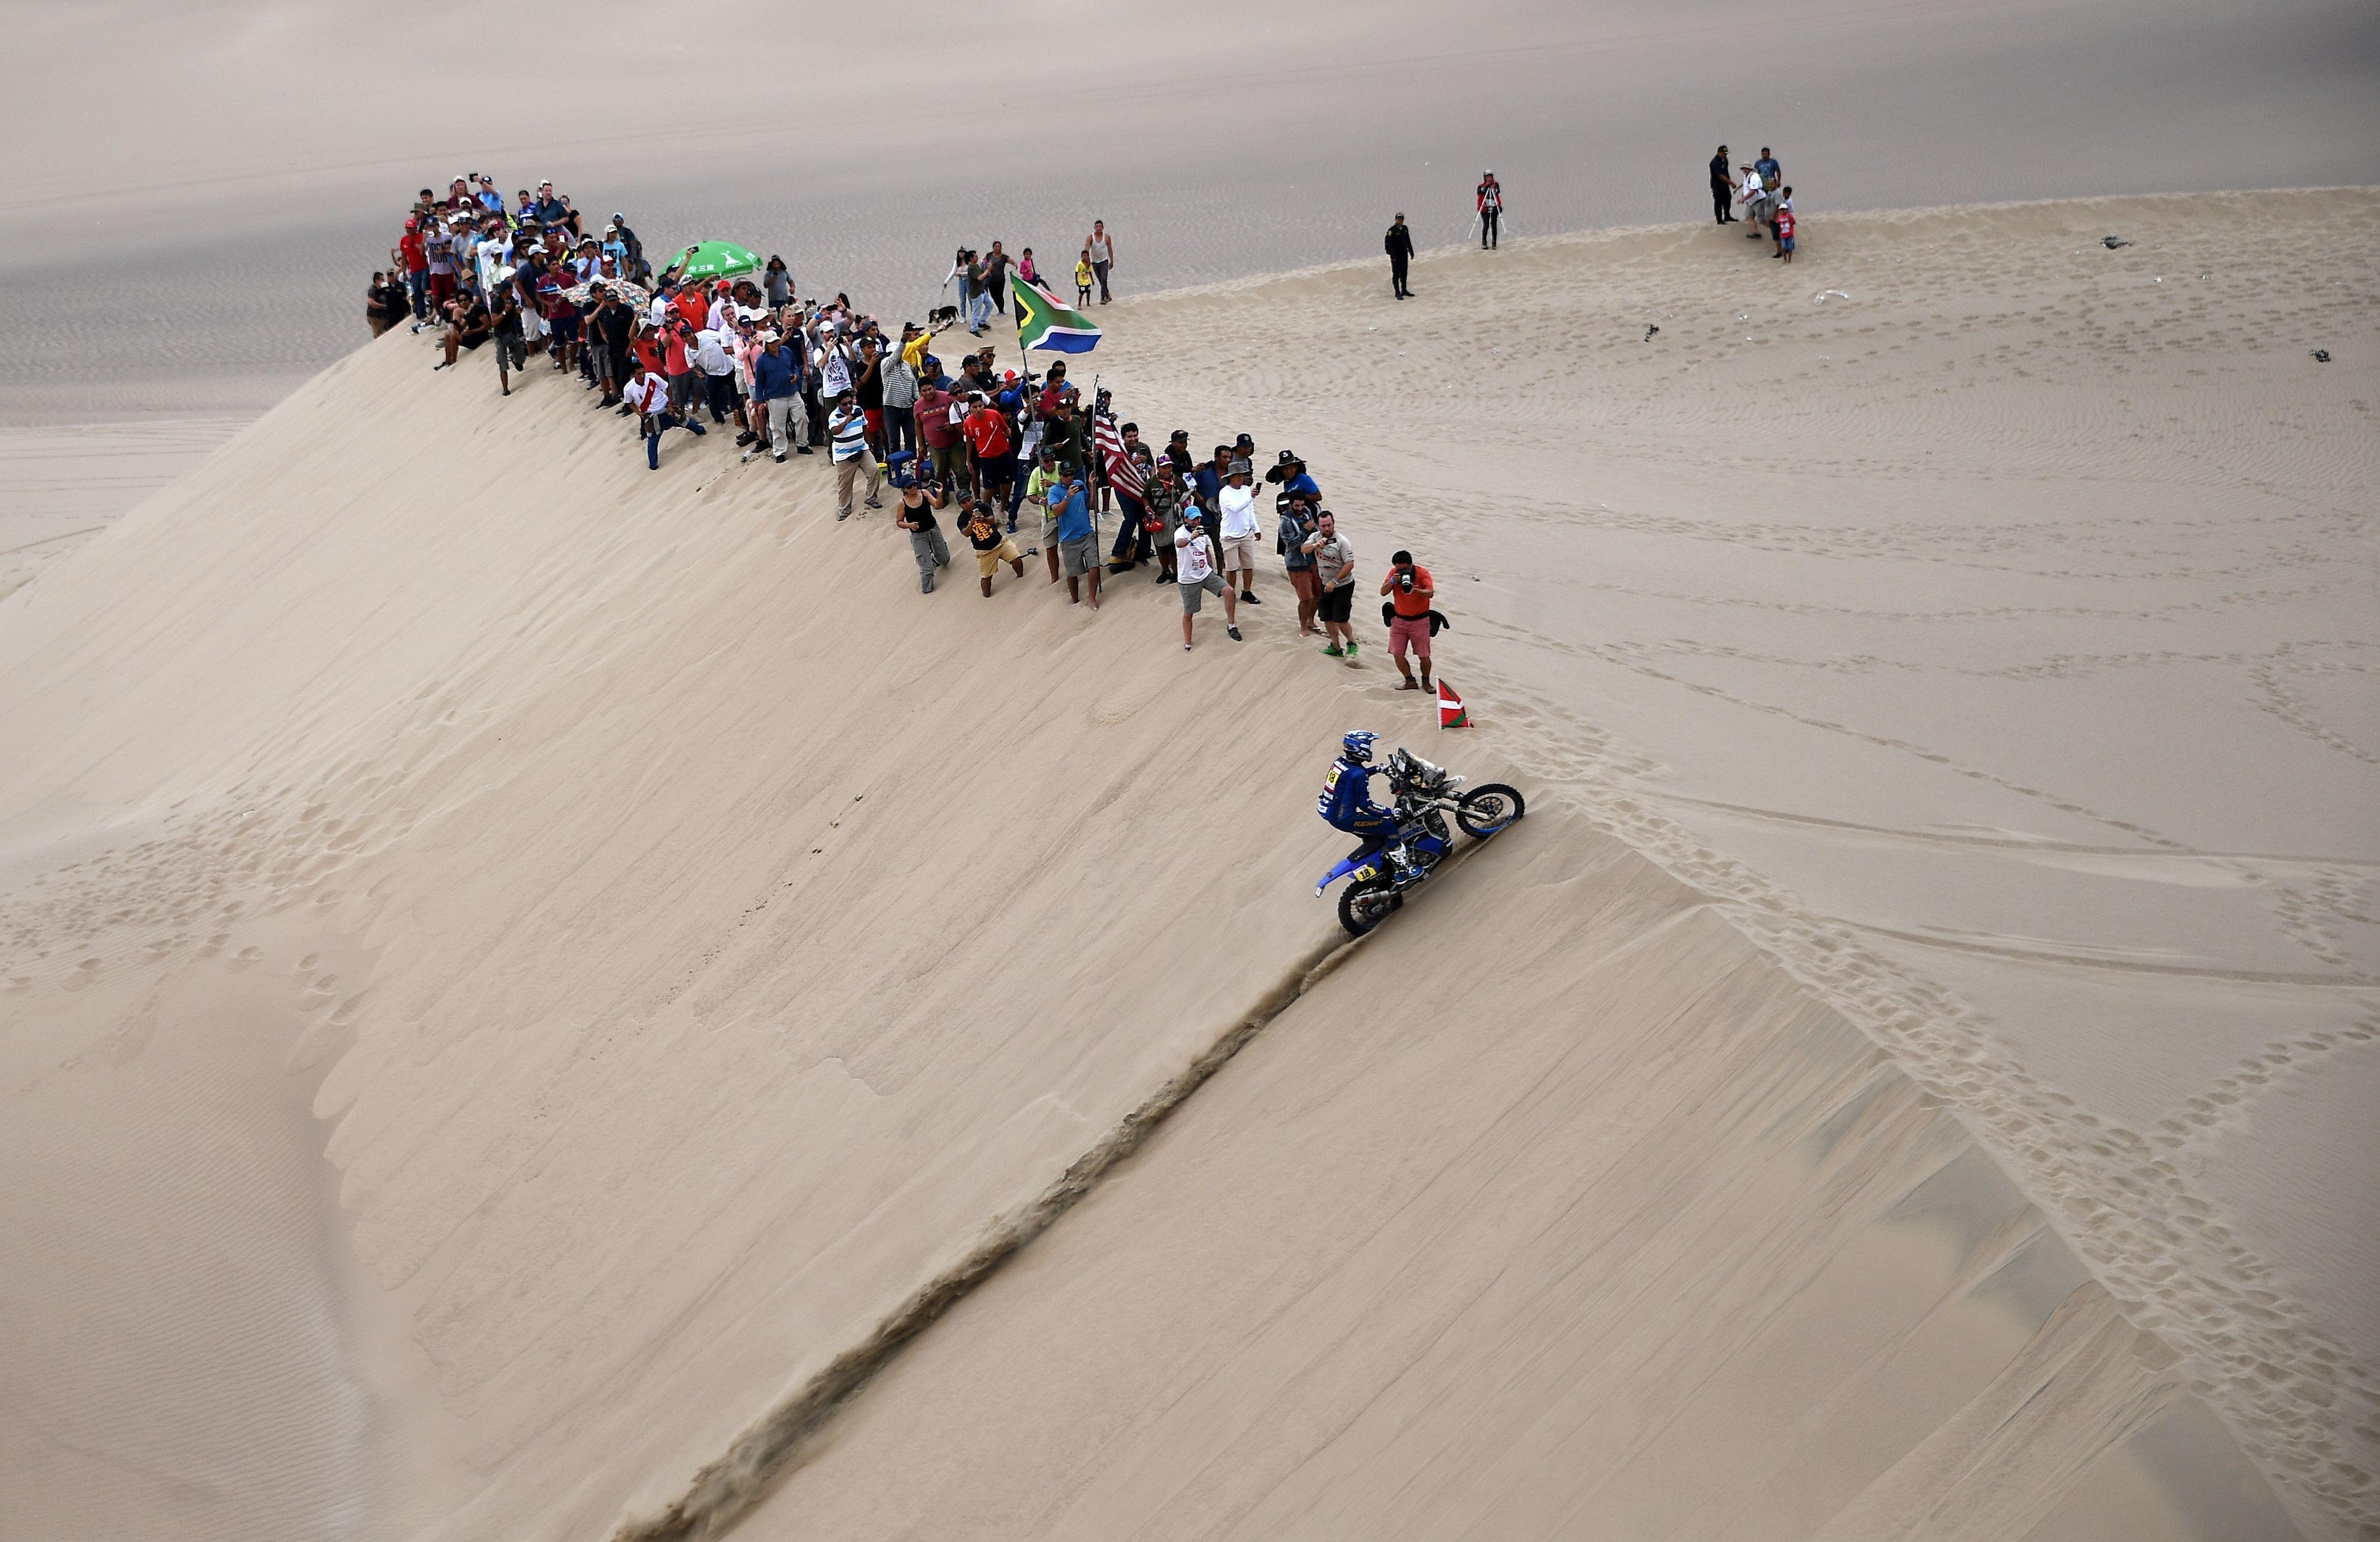 Spectators during the Dakar Rally